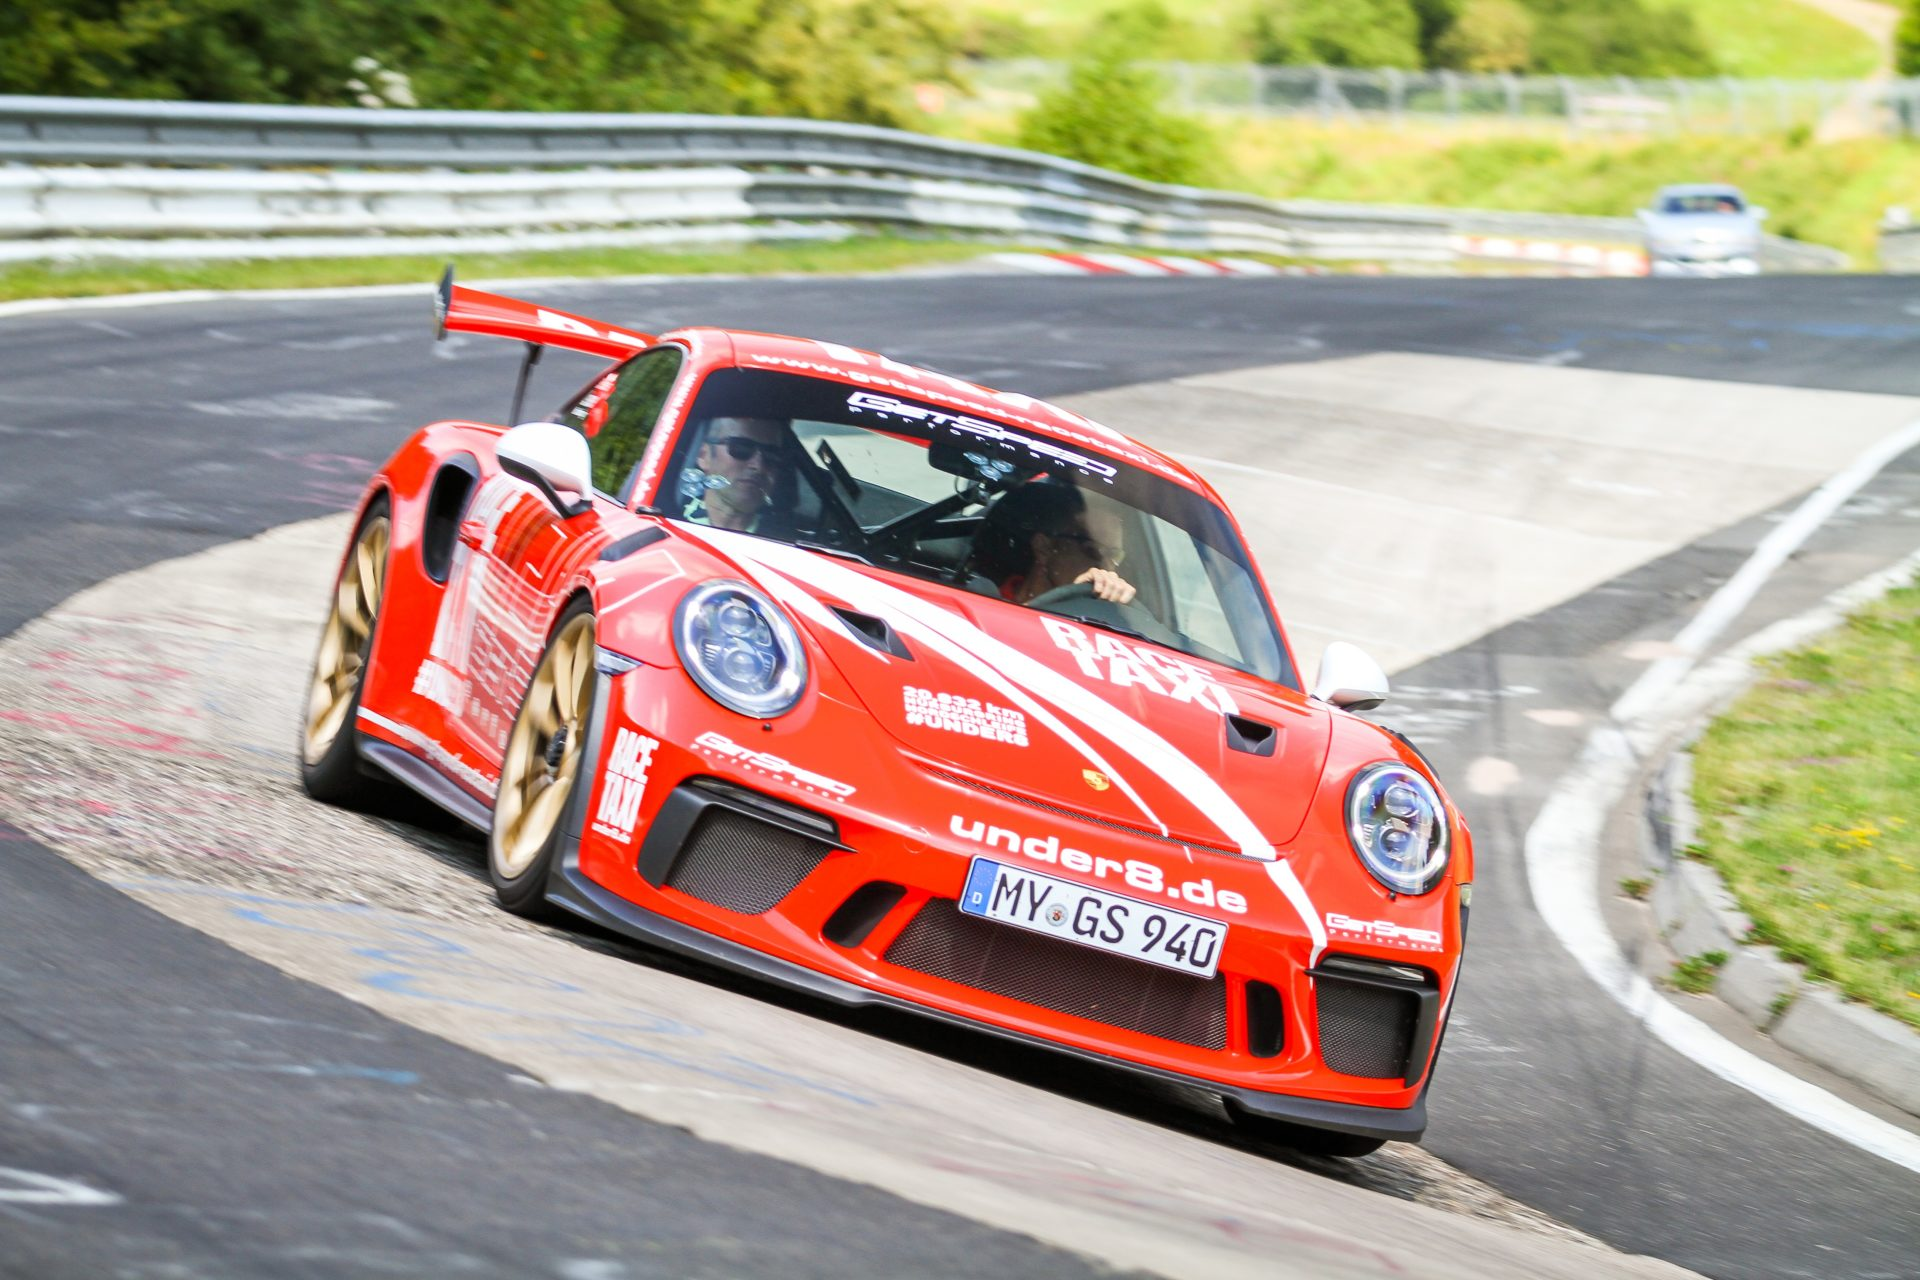 Voucher for a Co,Pilot ride on the Nürburgring Nordschleife (Porsche)